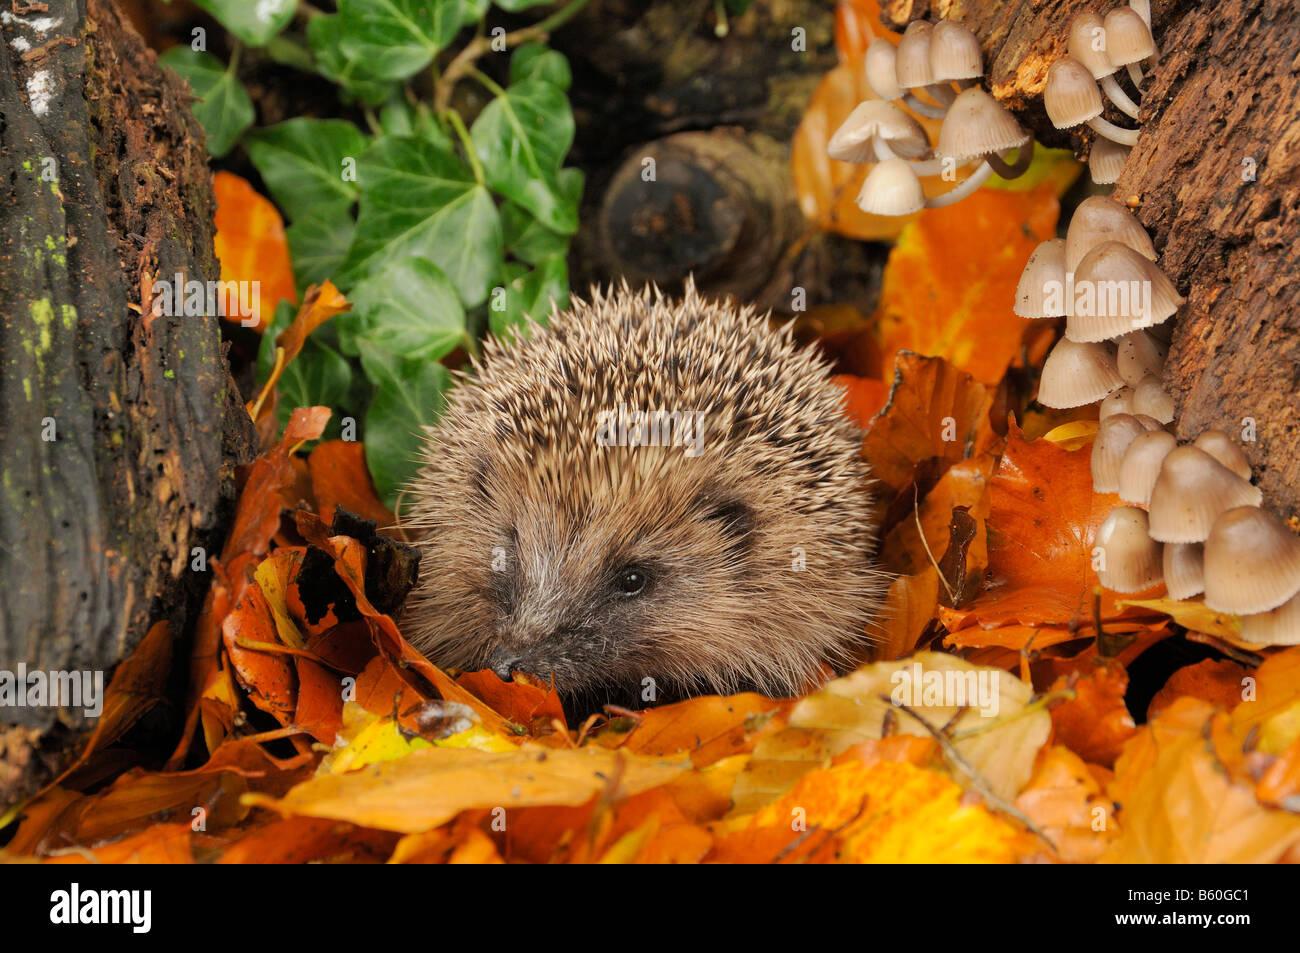 Hedgehog erinaceus europaeus foraging for food in autumn woodland setting UK Stock Photo